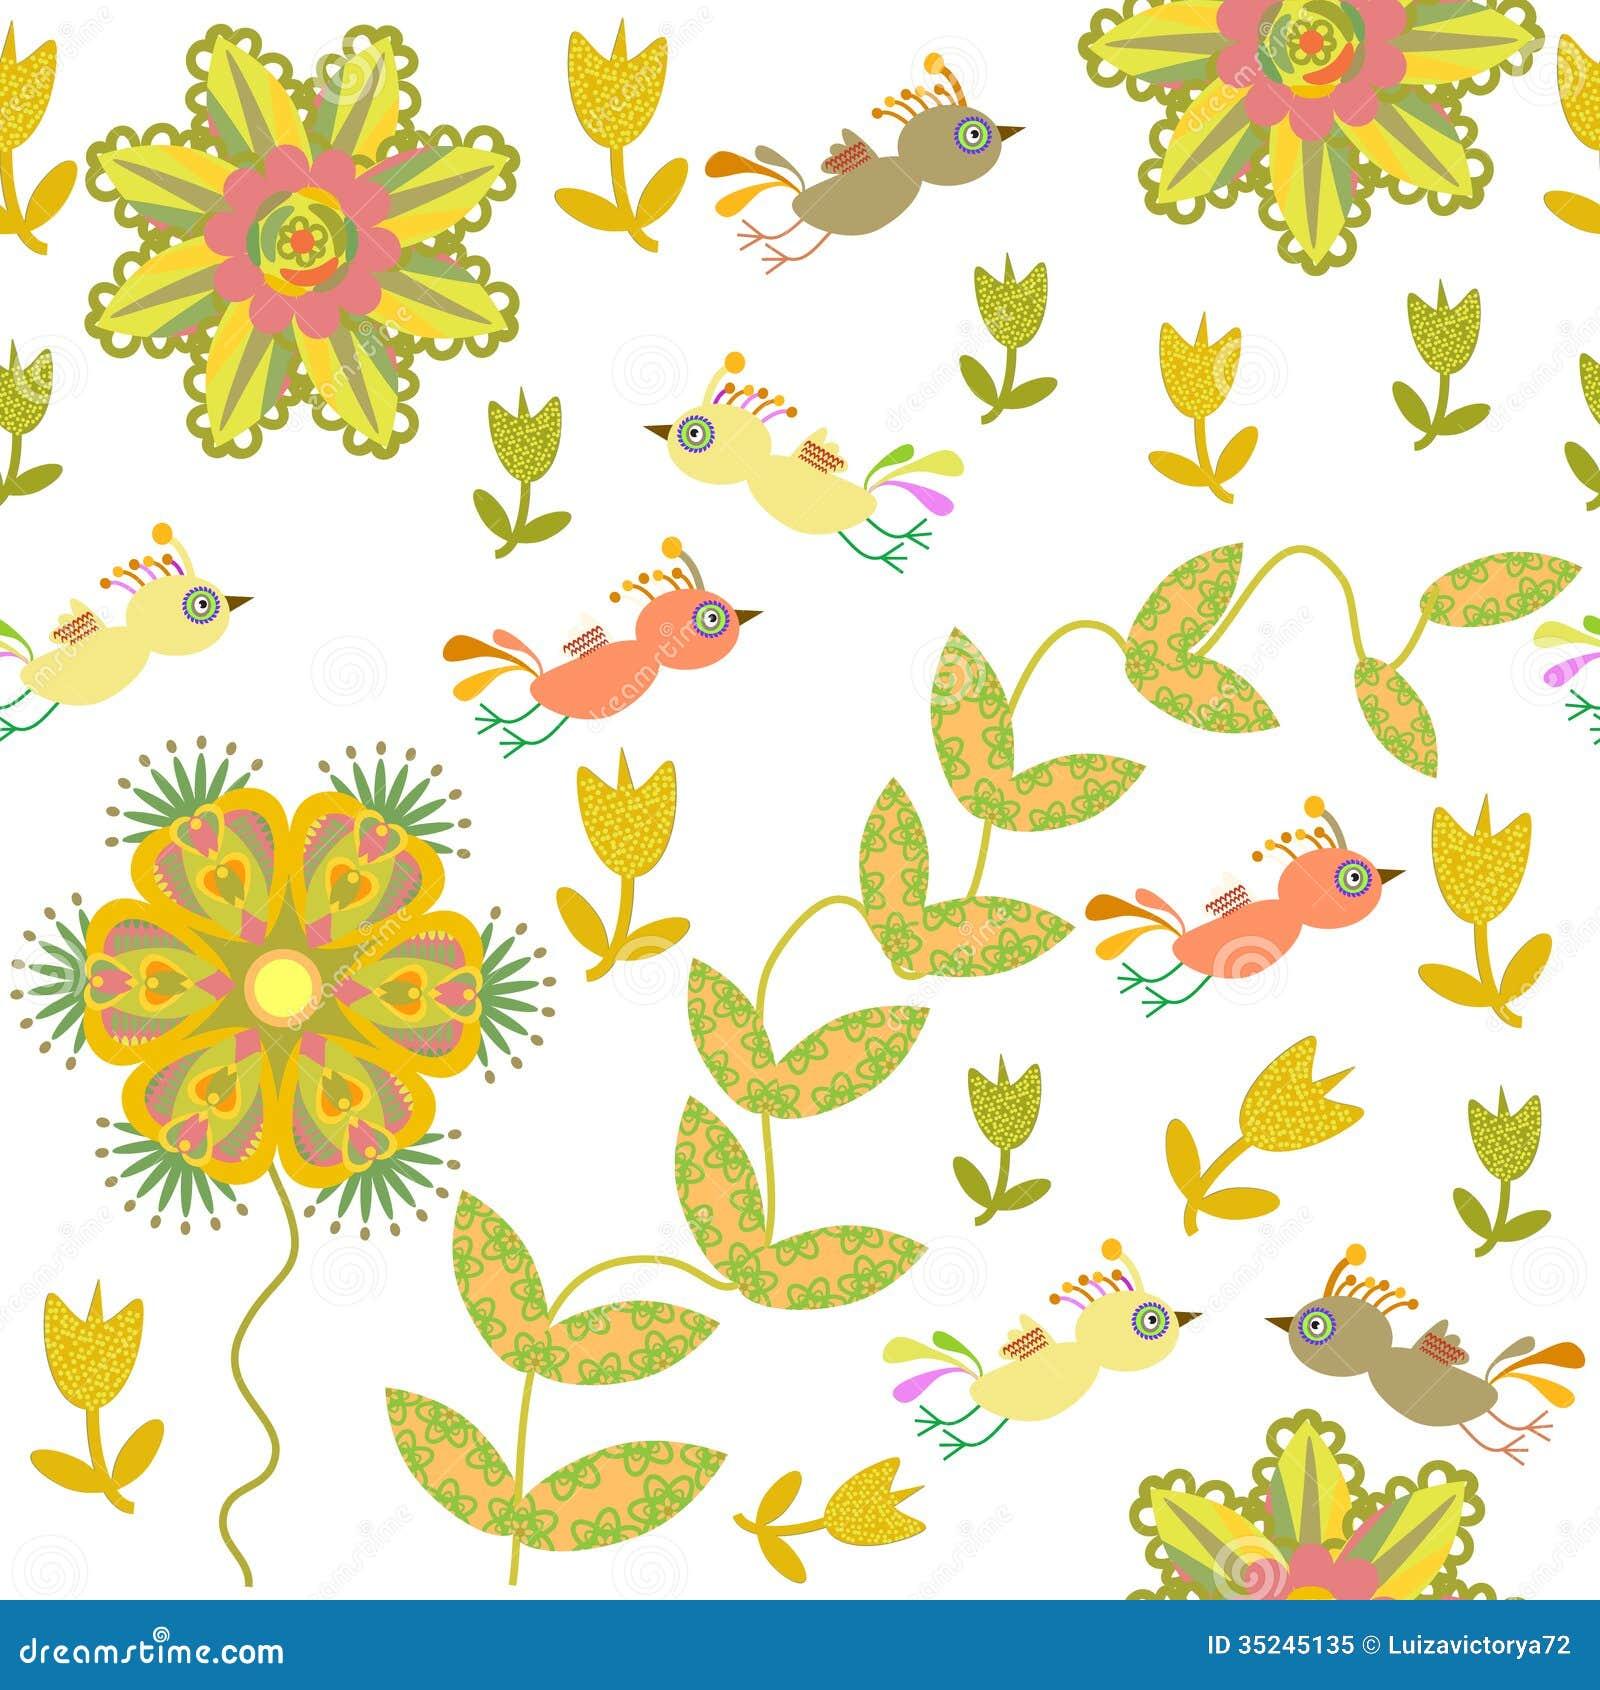 Cute Seamless Pattern With Cartoon Bird And Flower Stock ...